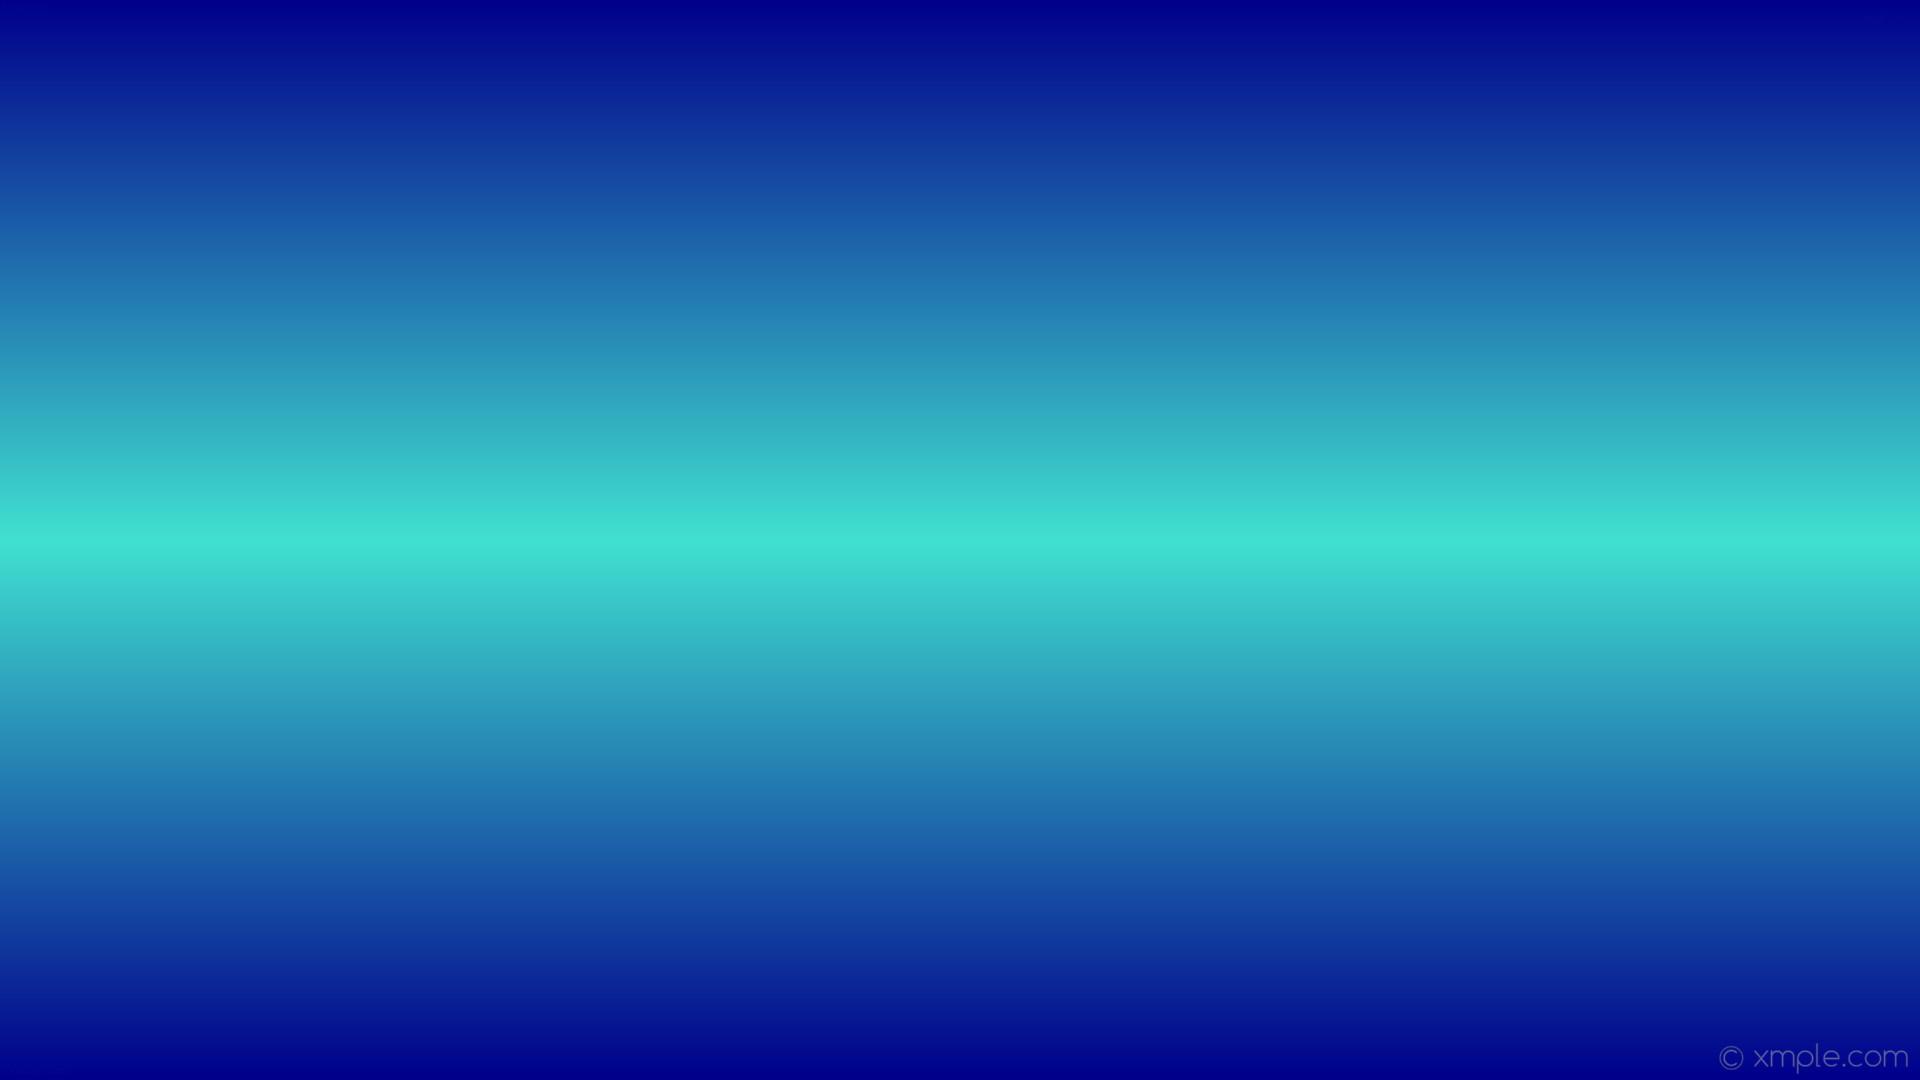 wallpaper highlight blue gradient linear dark blue turquoise #00008b  #40e0d0 90° 50%